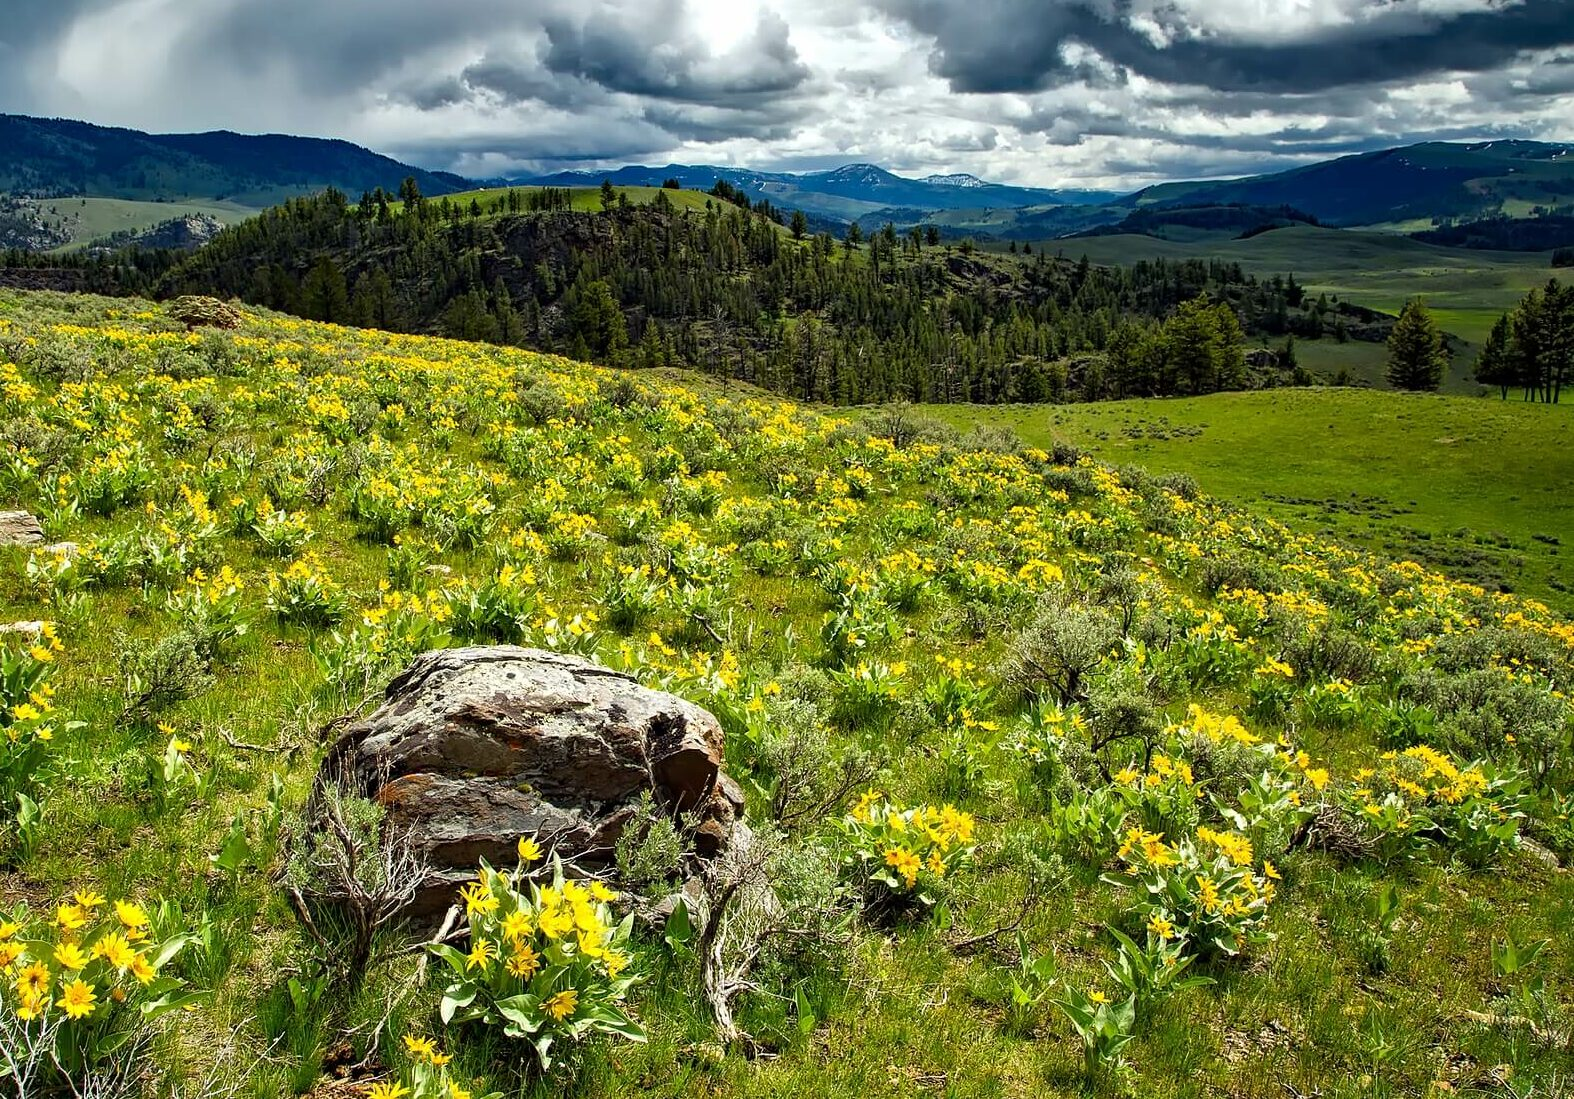 Yellowstone National Park plant life